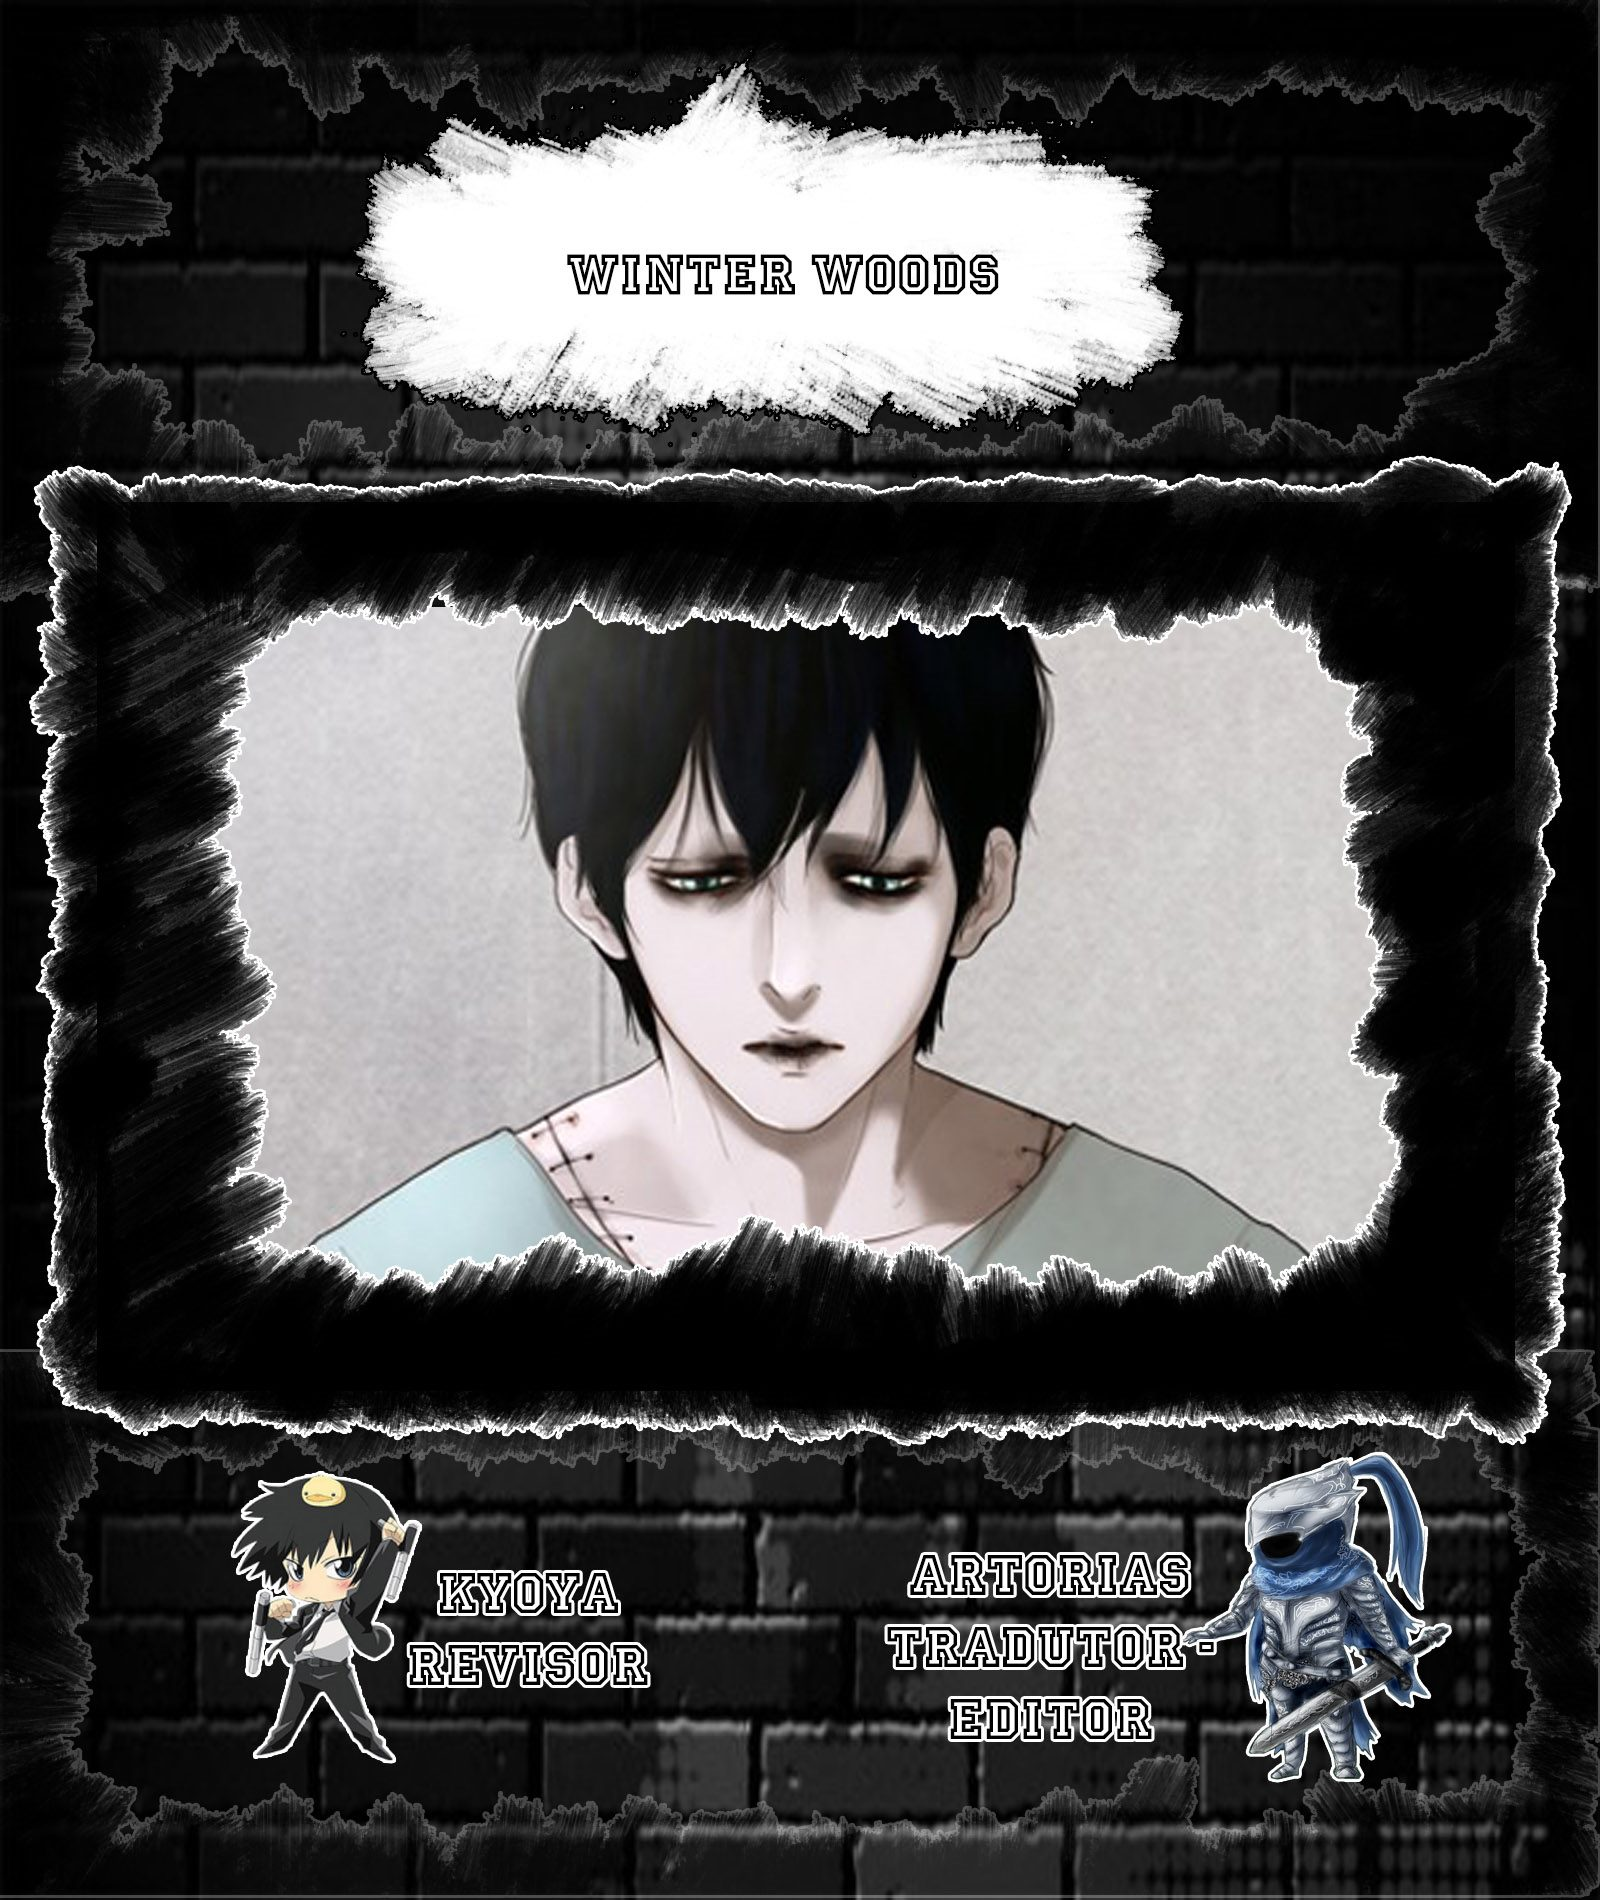 https://nine.mangadogs.com/br_manga/pic/33/1953/1249969/WinterWoods001624.jpg Page 1